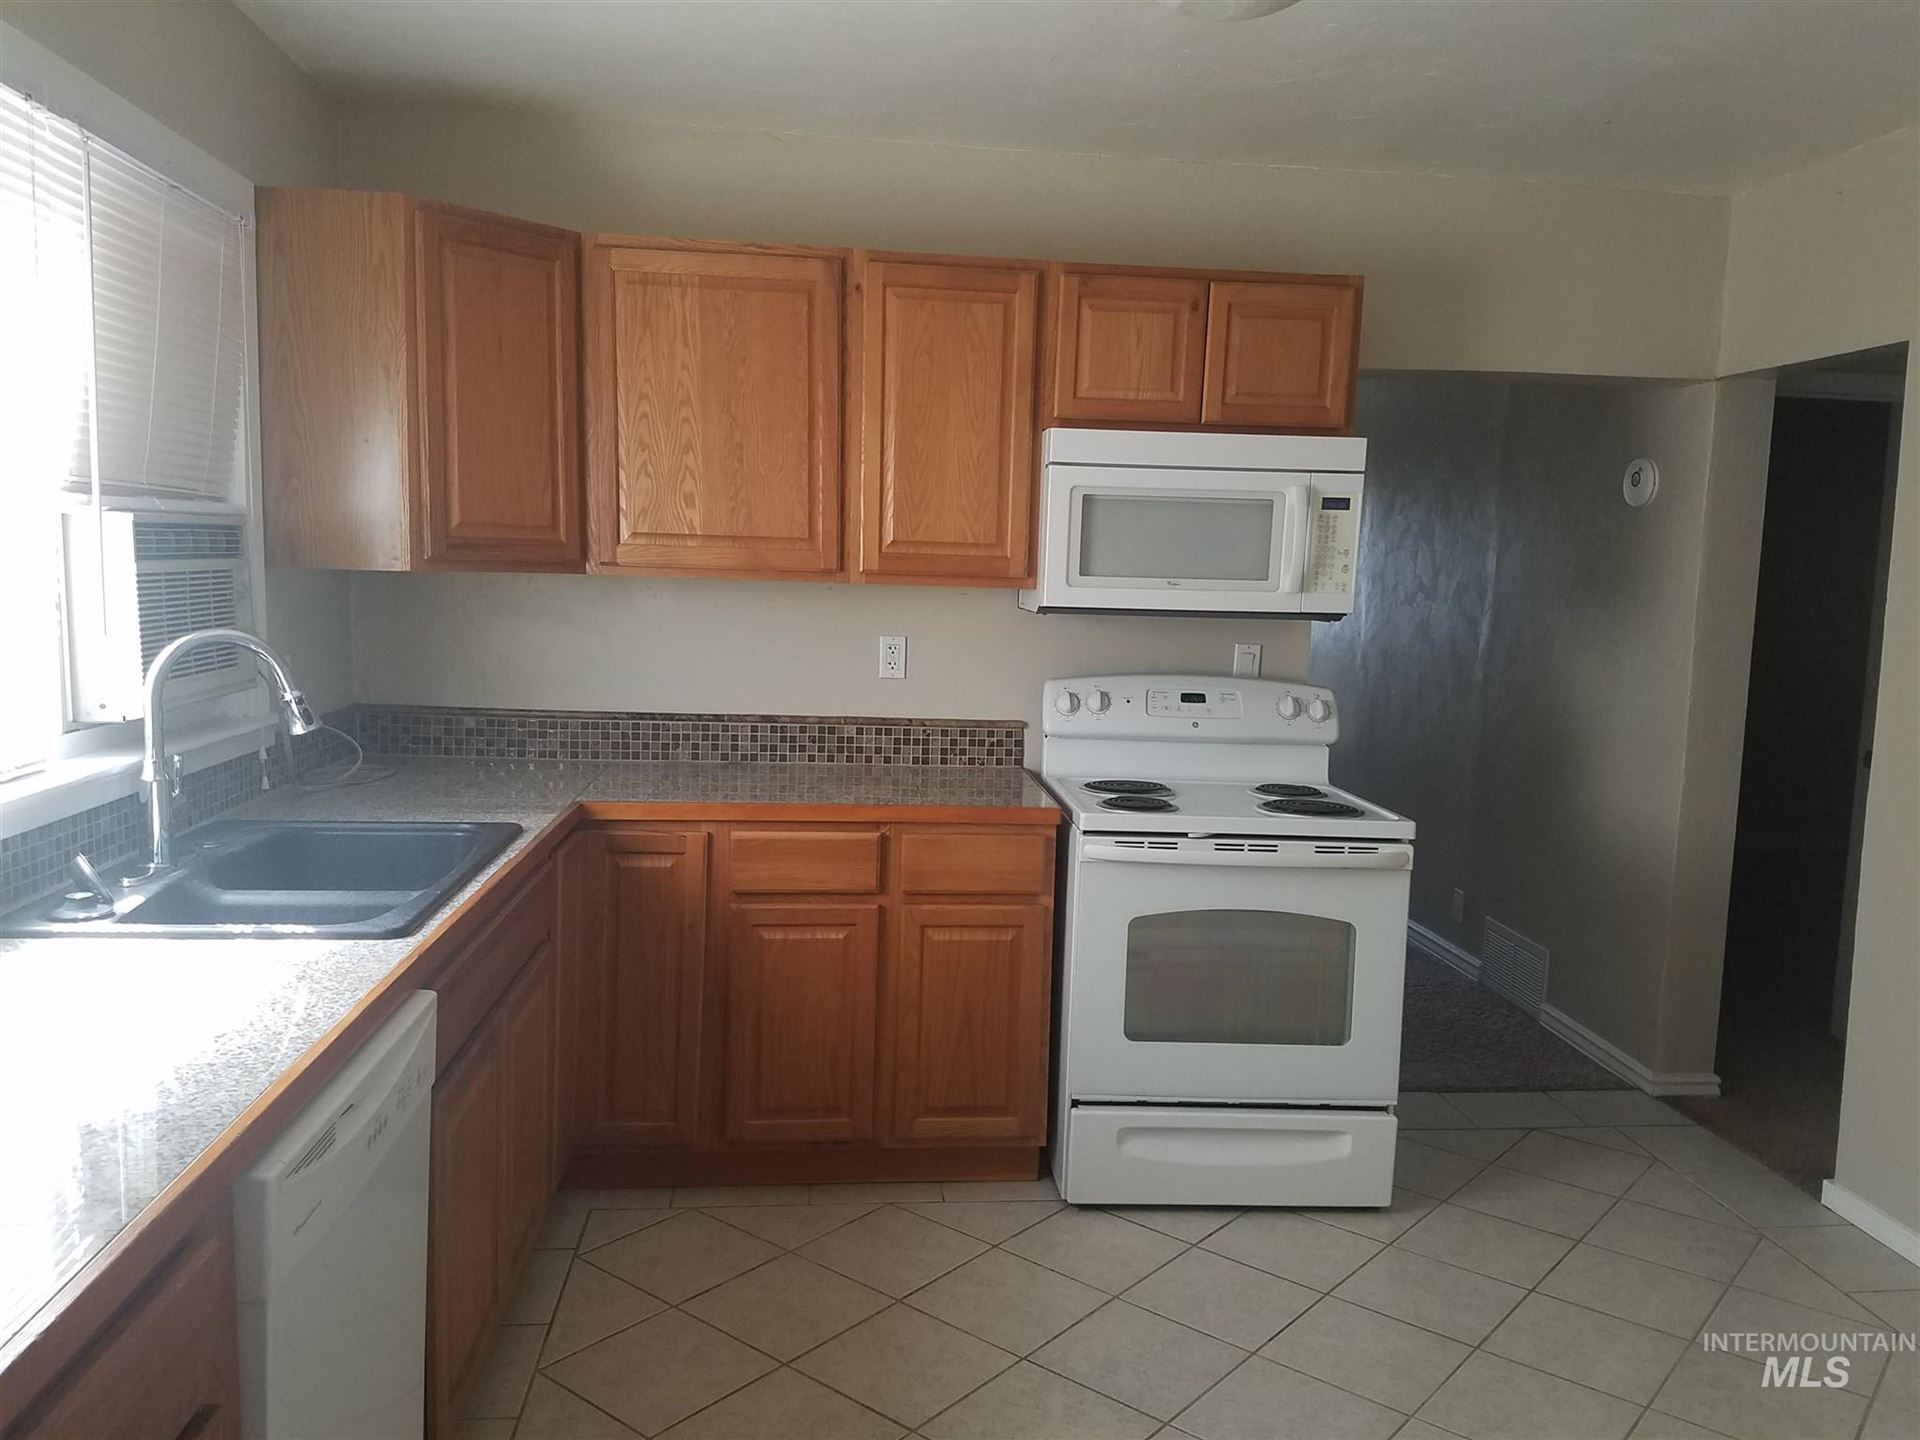 Photo of 126 11 th Avenue W, Gooding, ID 83330 (MLS # 98776640)